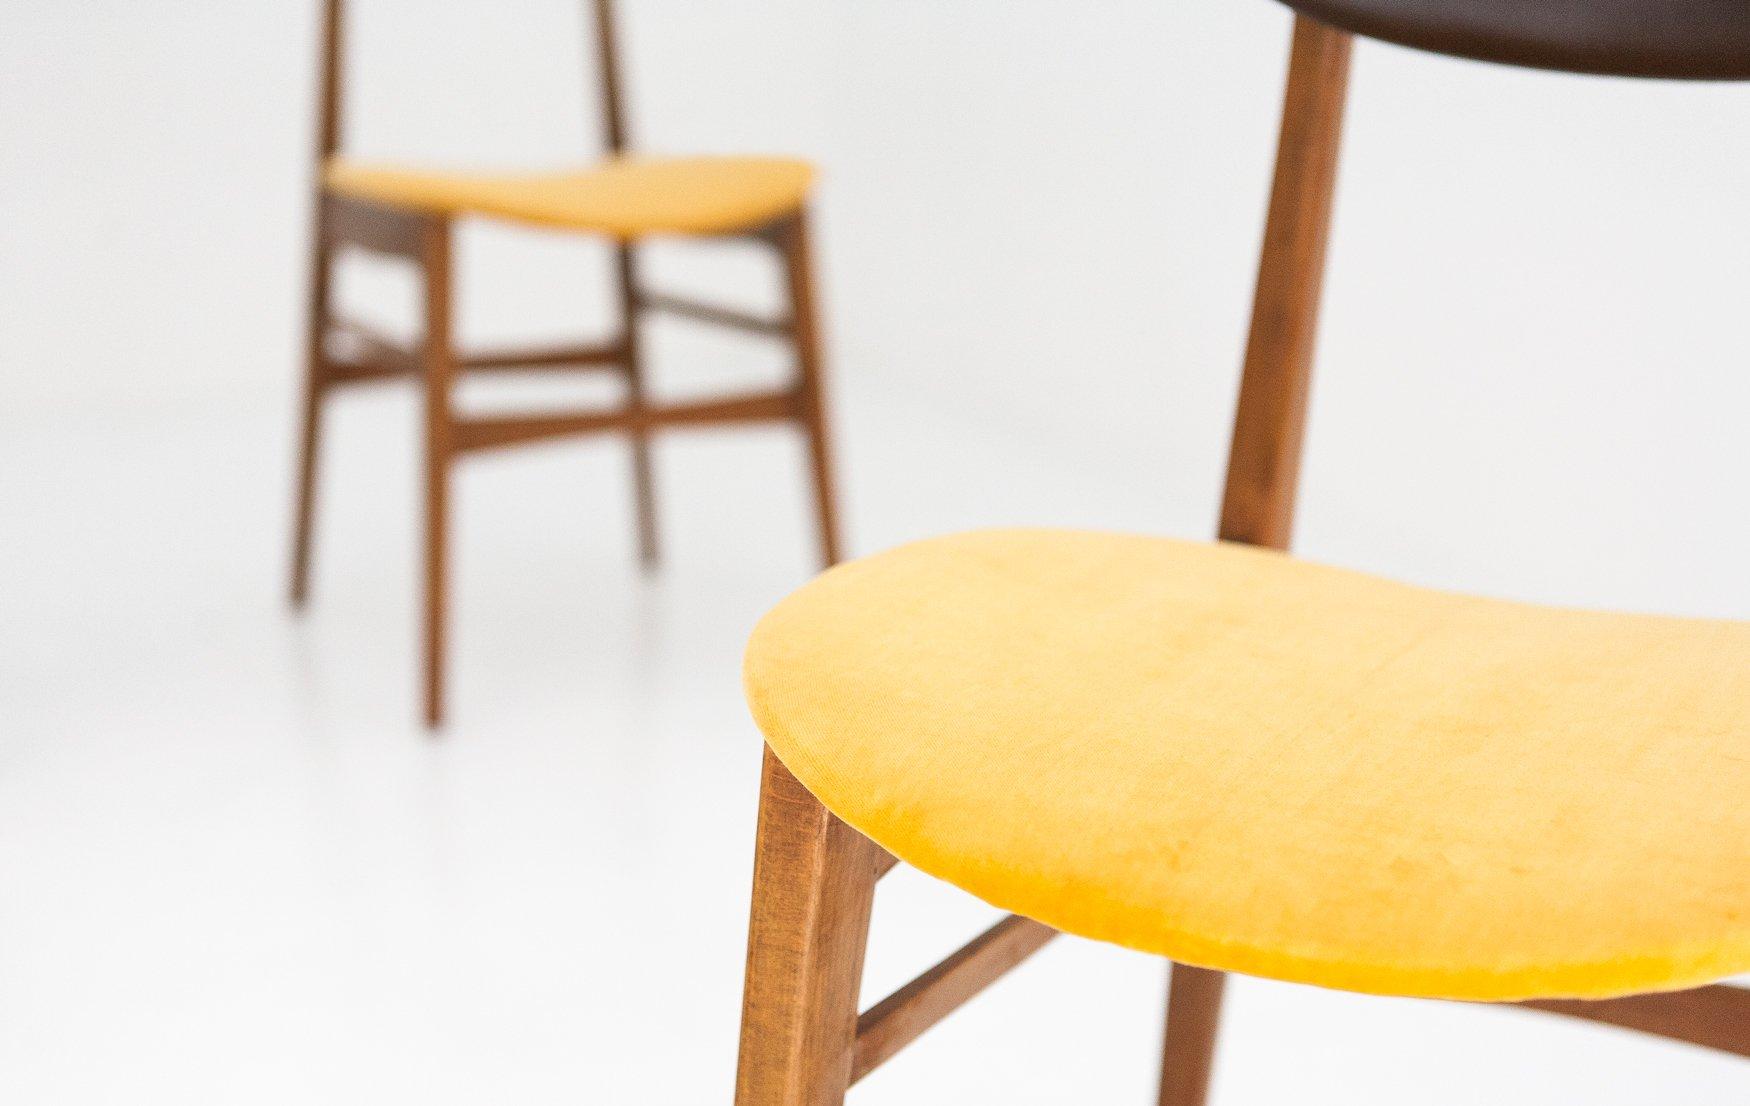 Mid Century Swedish Skai & Velvet Chairs 1950s Set of 4 for sale